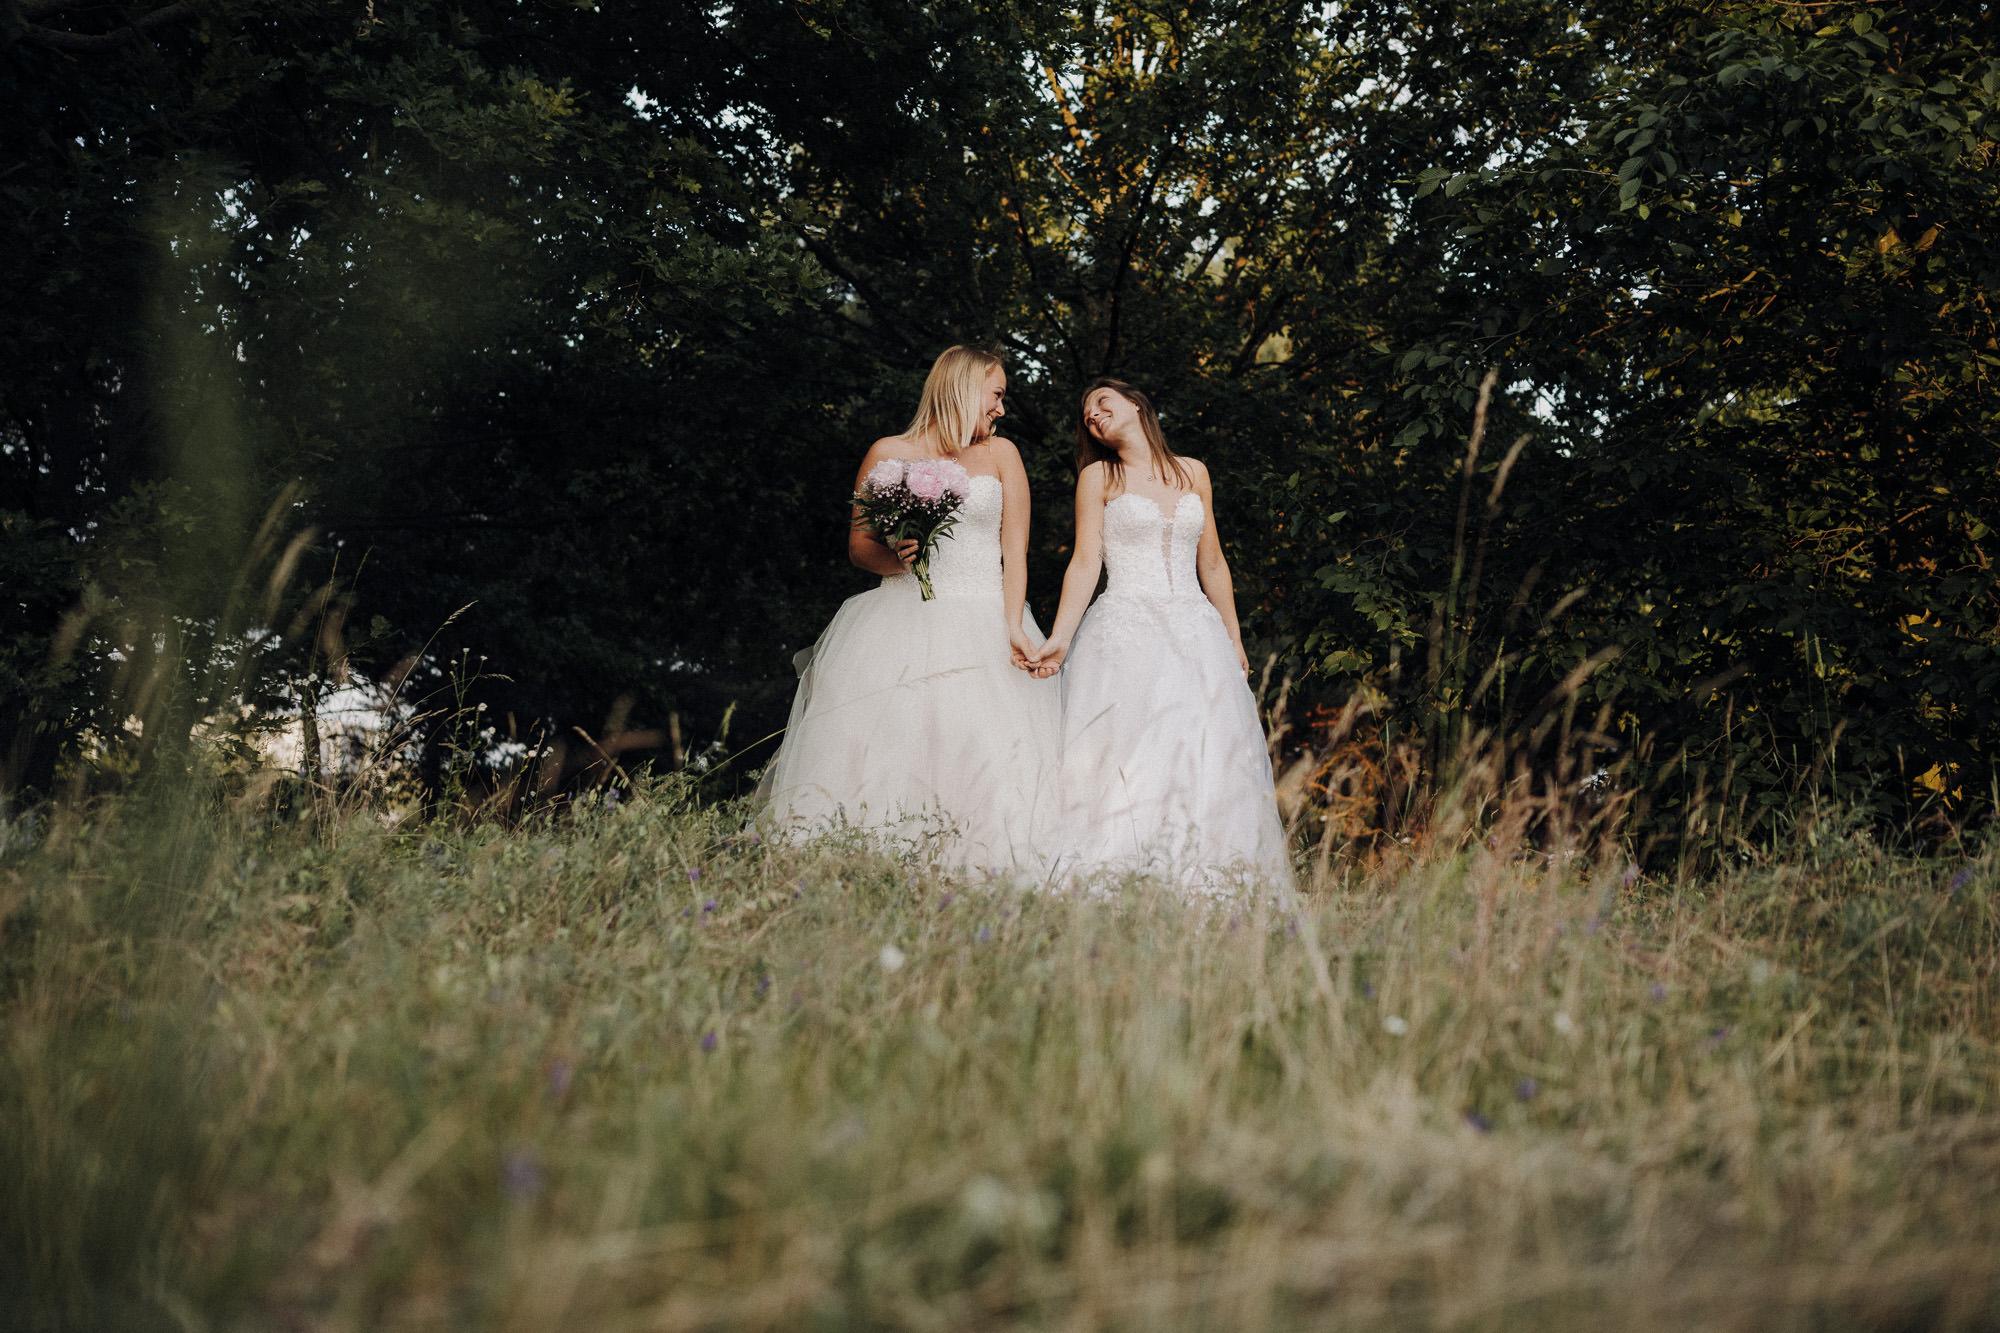 waltsmedia-hochzeitsreportage-after-wedding-shooting-berlin-1